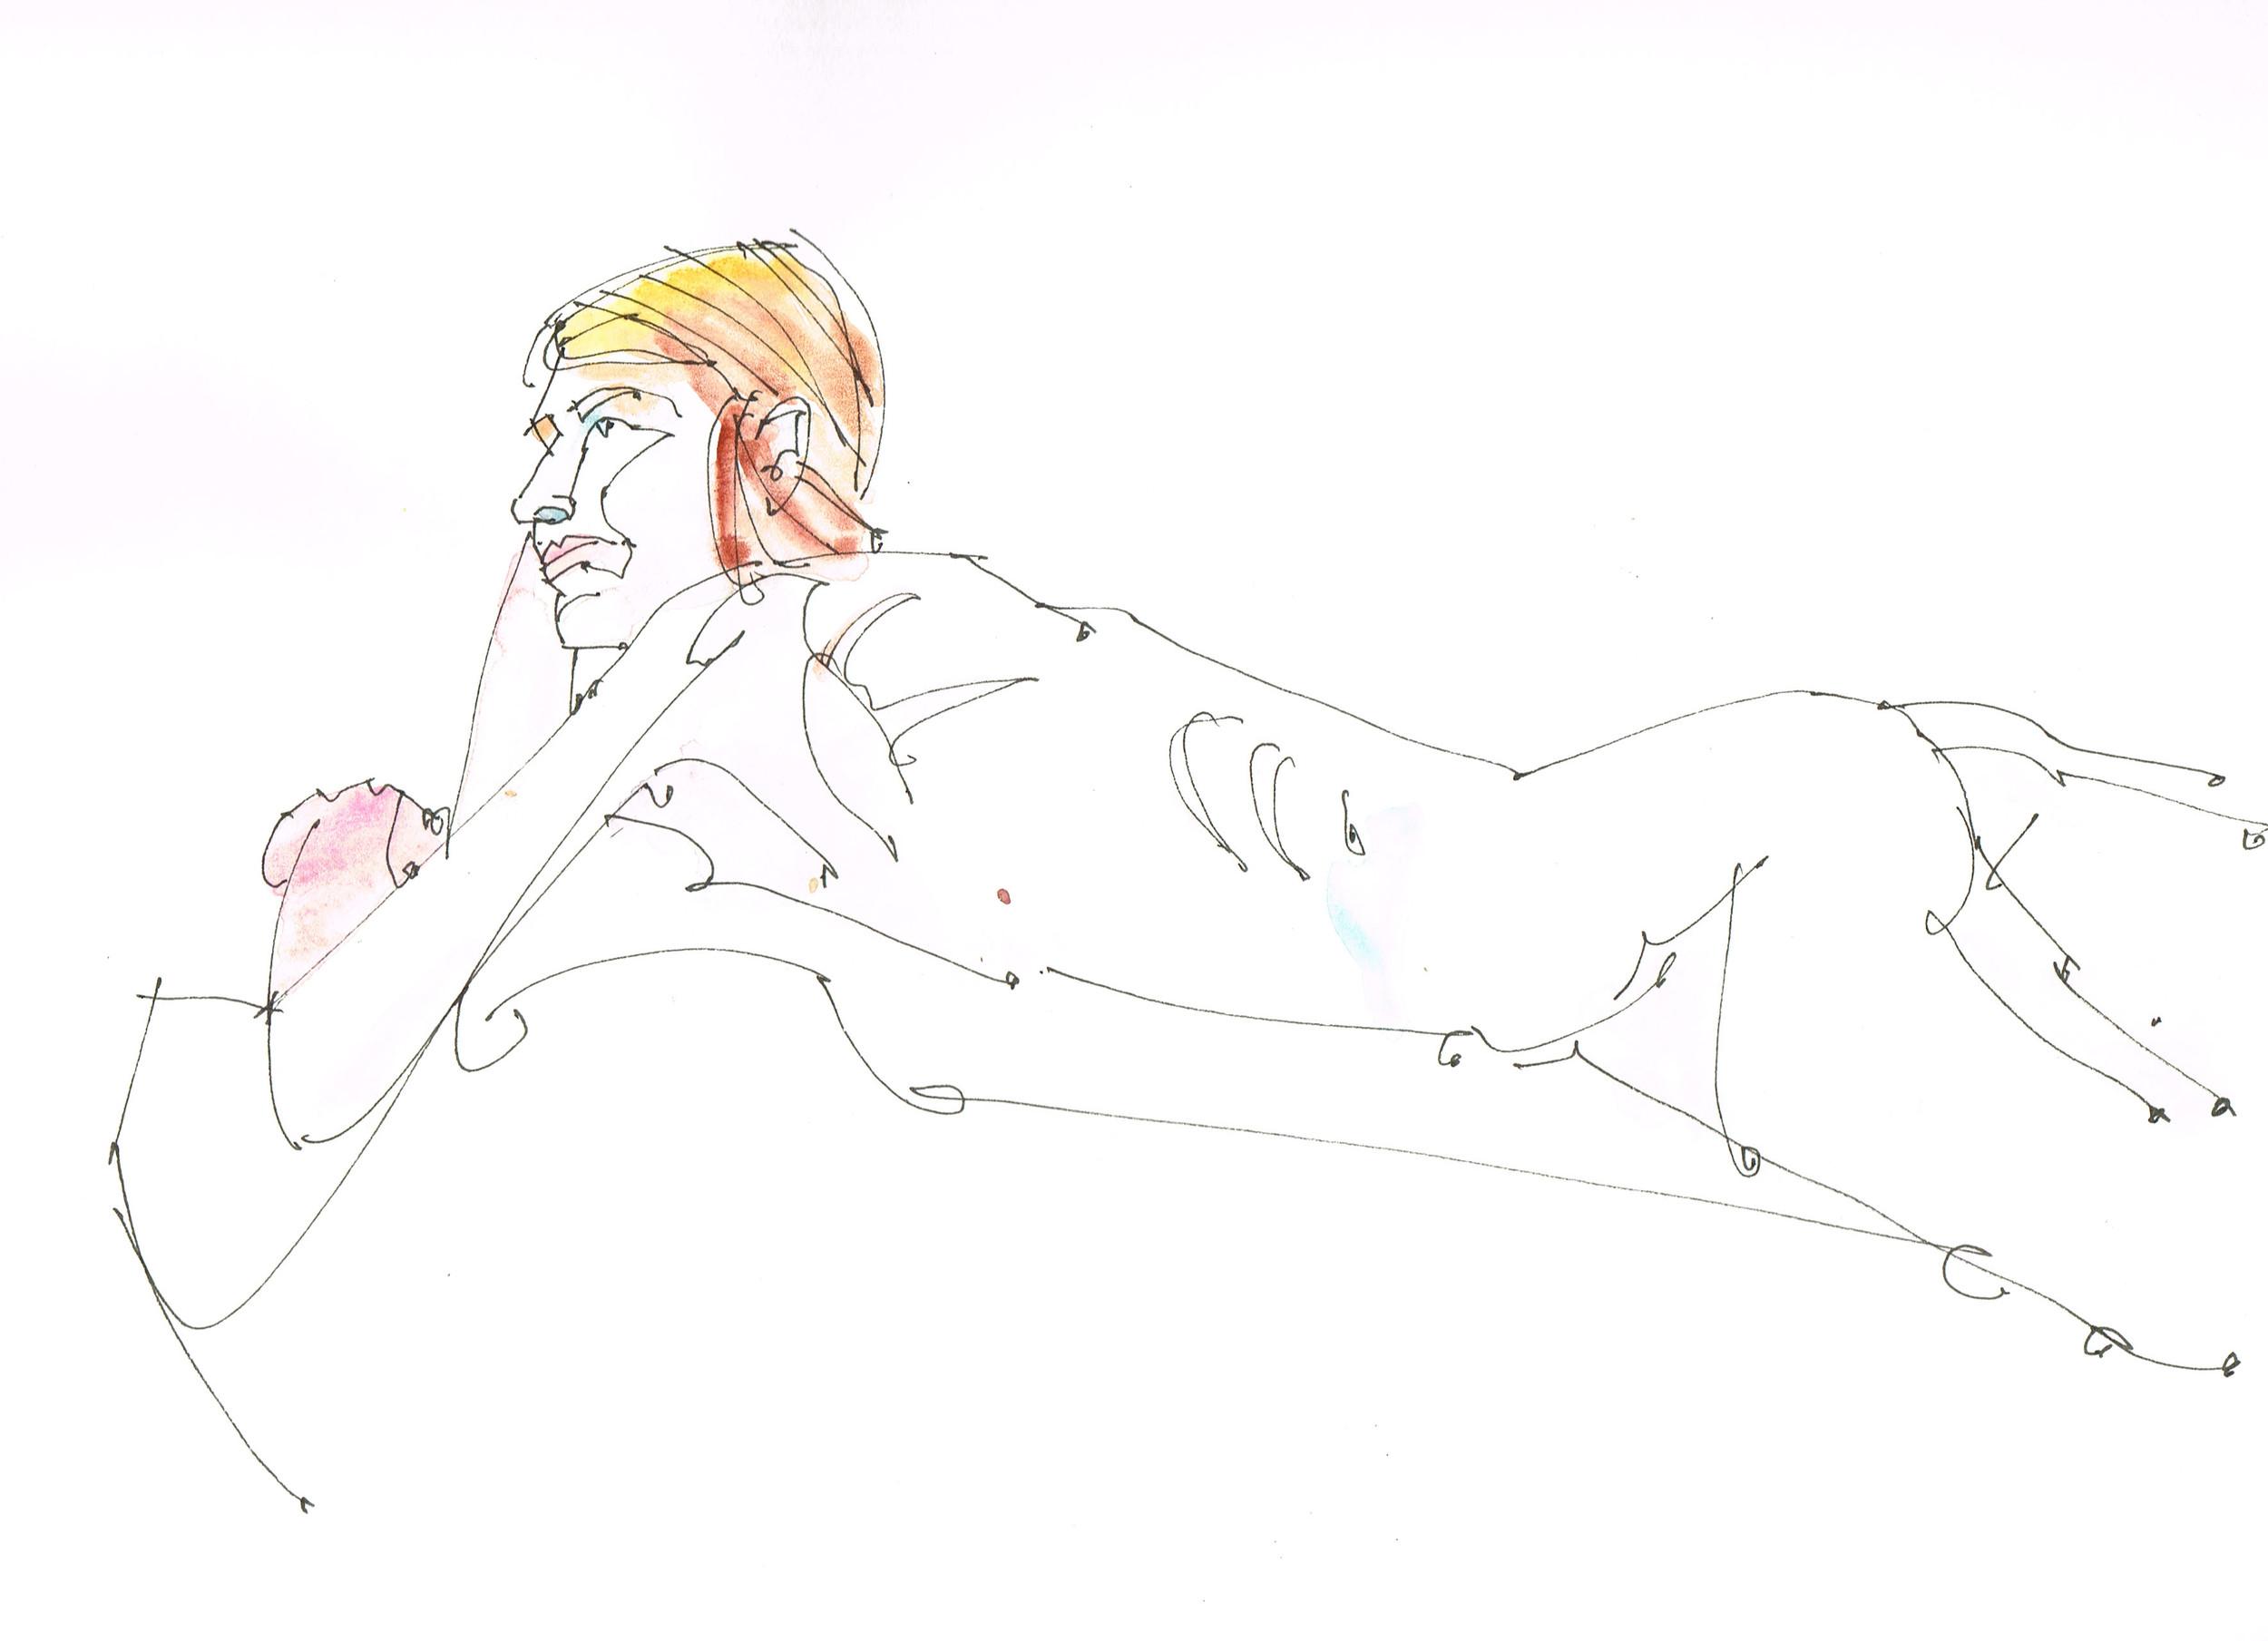 life drawing-620151005.jpg